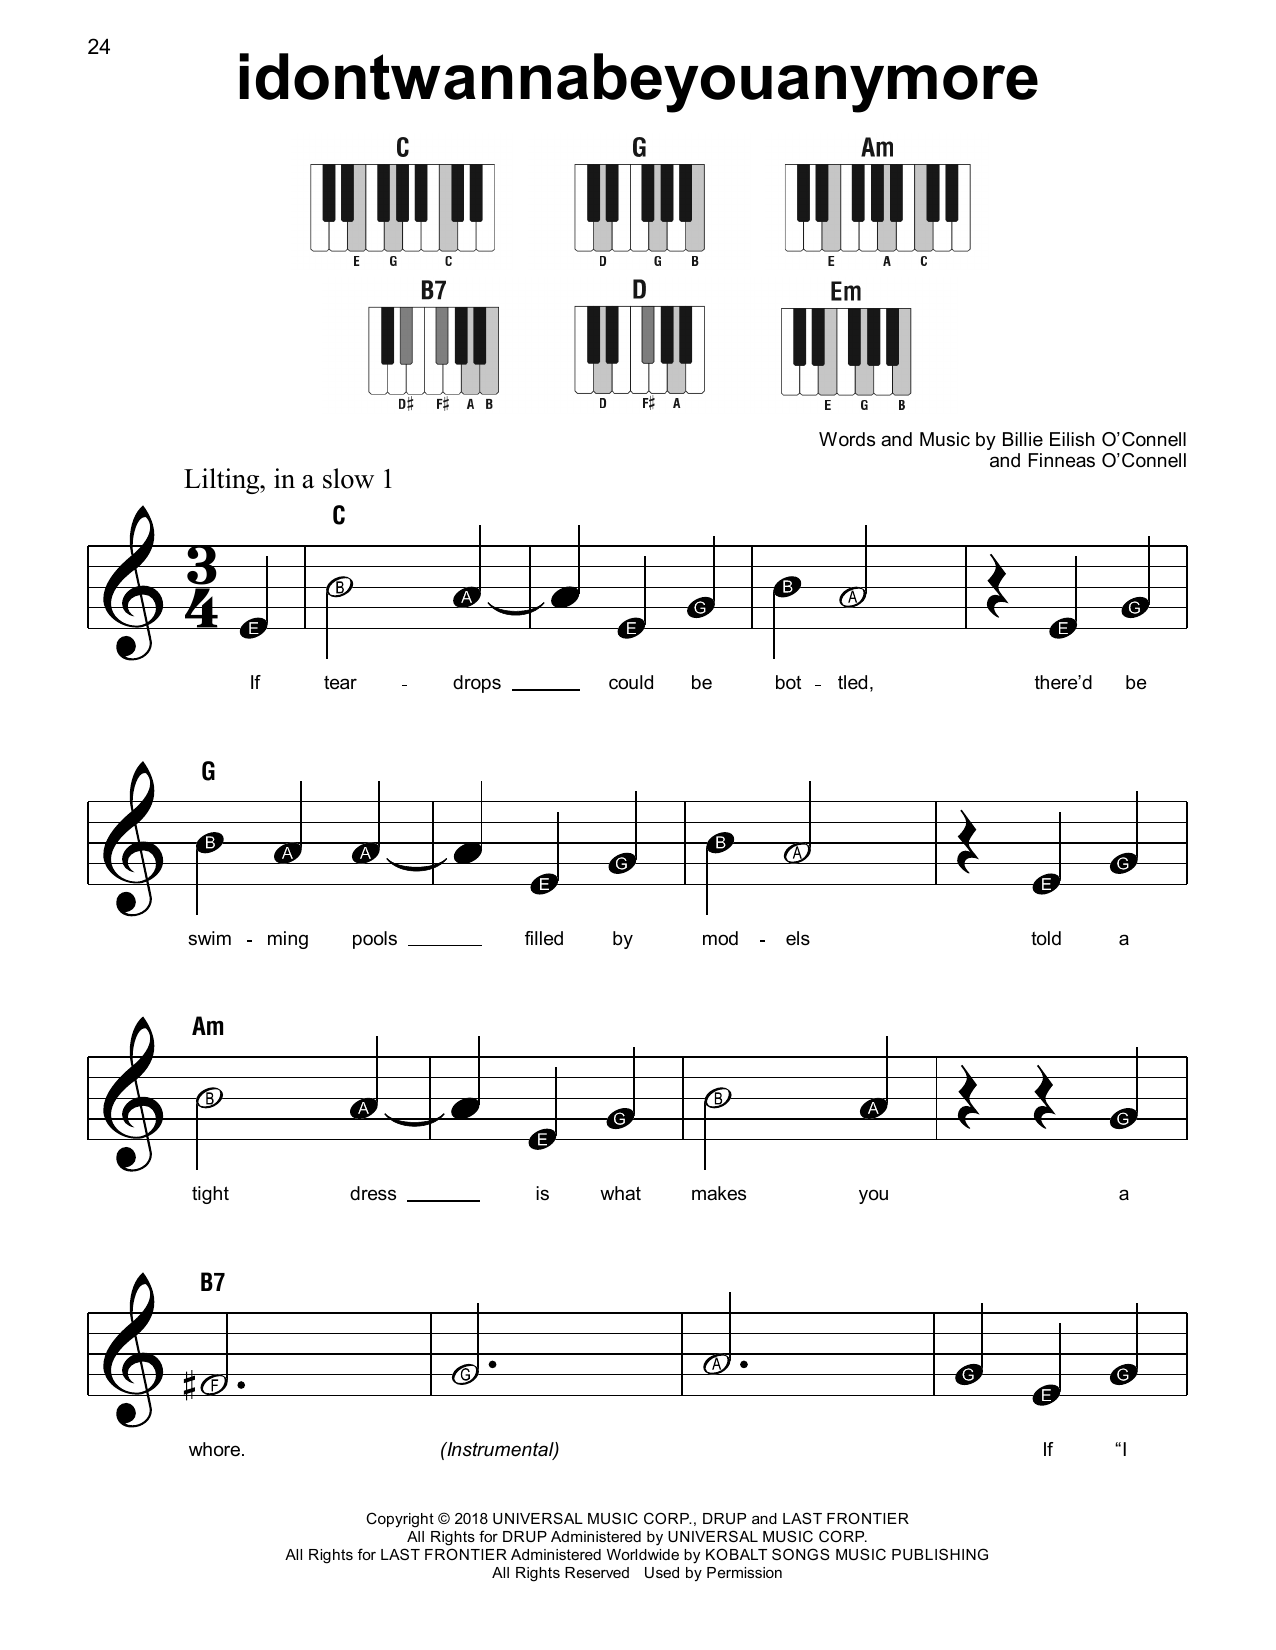 idontwannabeyouanymore (Super Easy Piano)